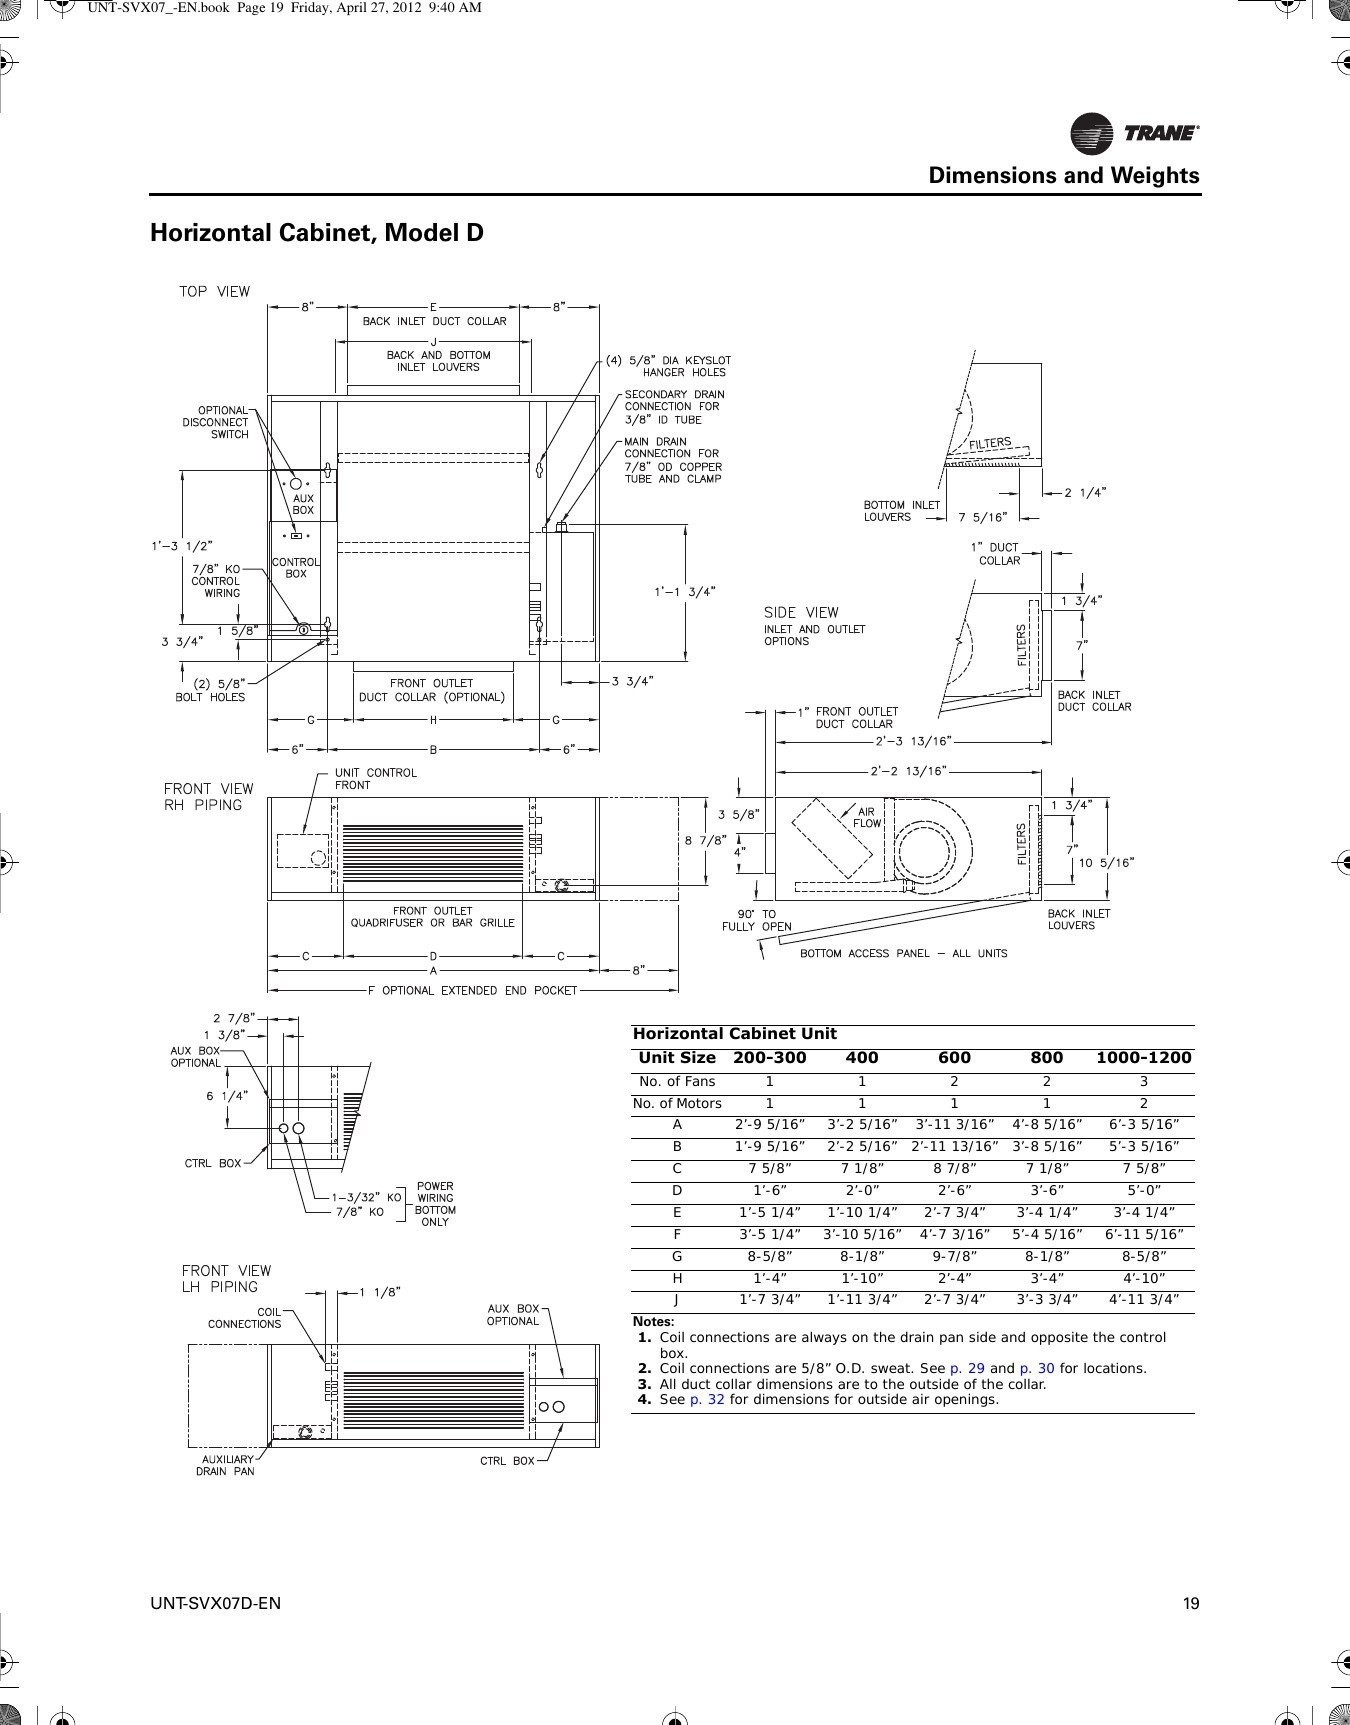 electrolux 2100 parts diagram trane xl90 parts manual